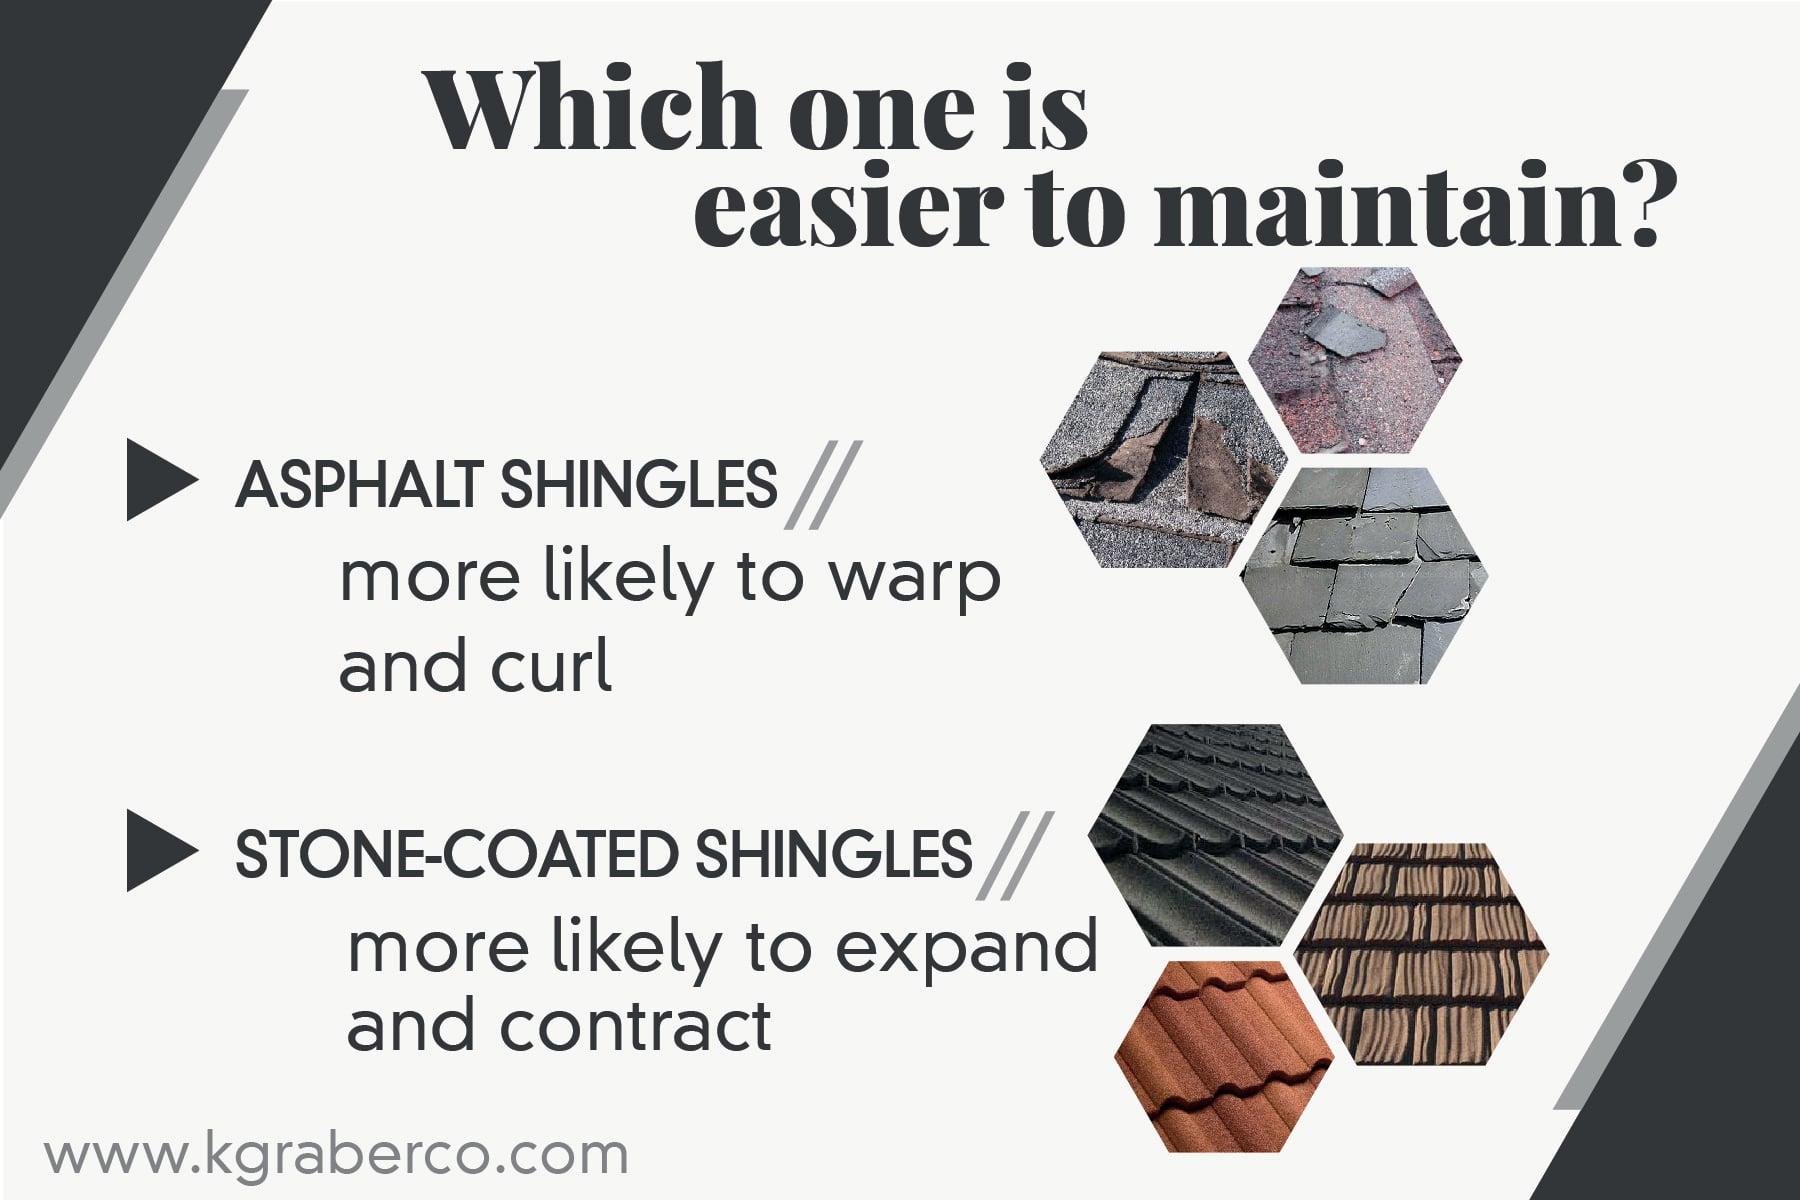 Are asphalt shingles easy to maintain